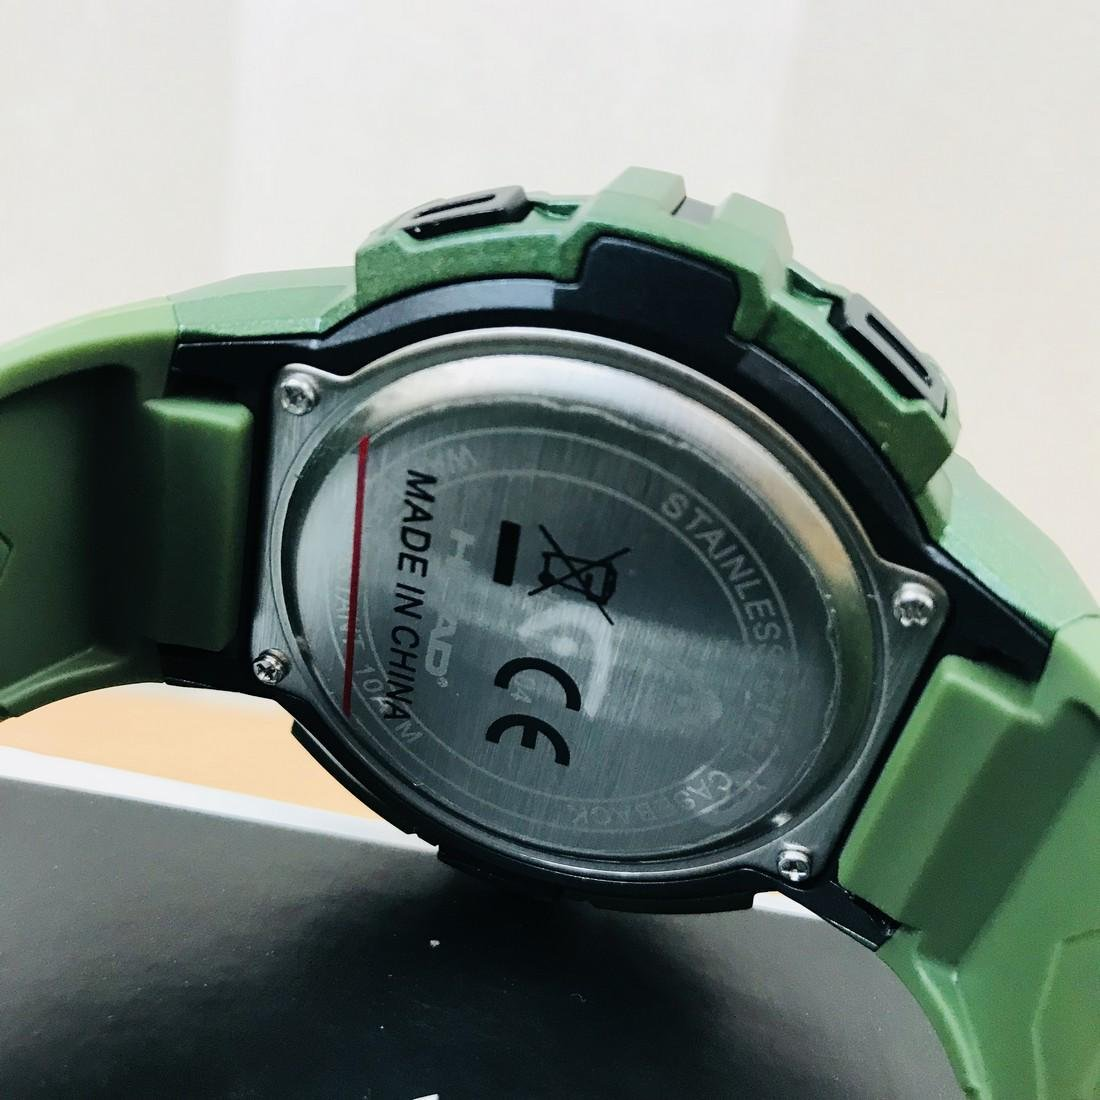 HEAD Super G Green Multifunctional Watch - 4